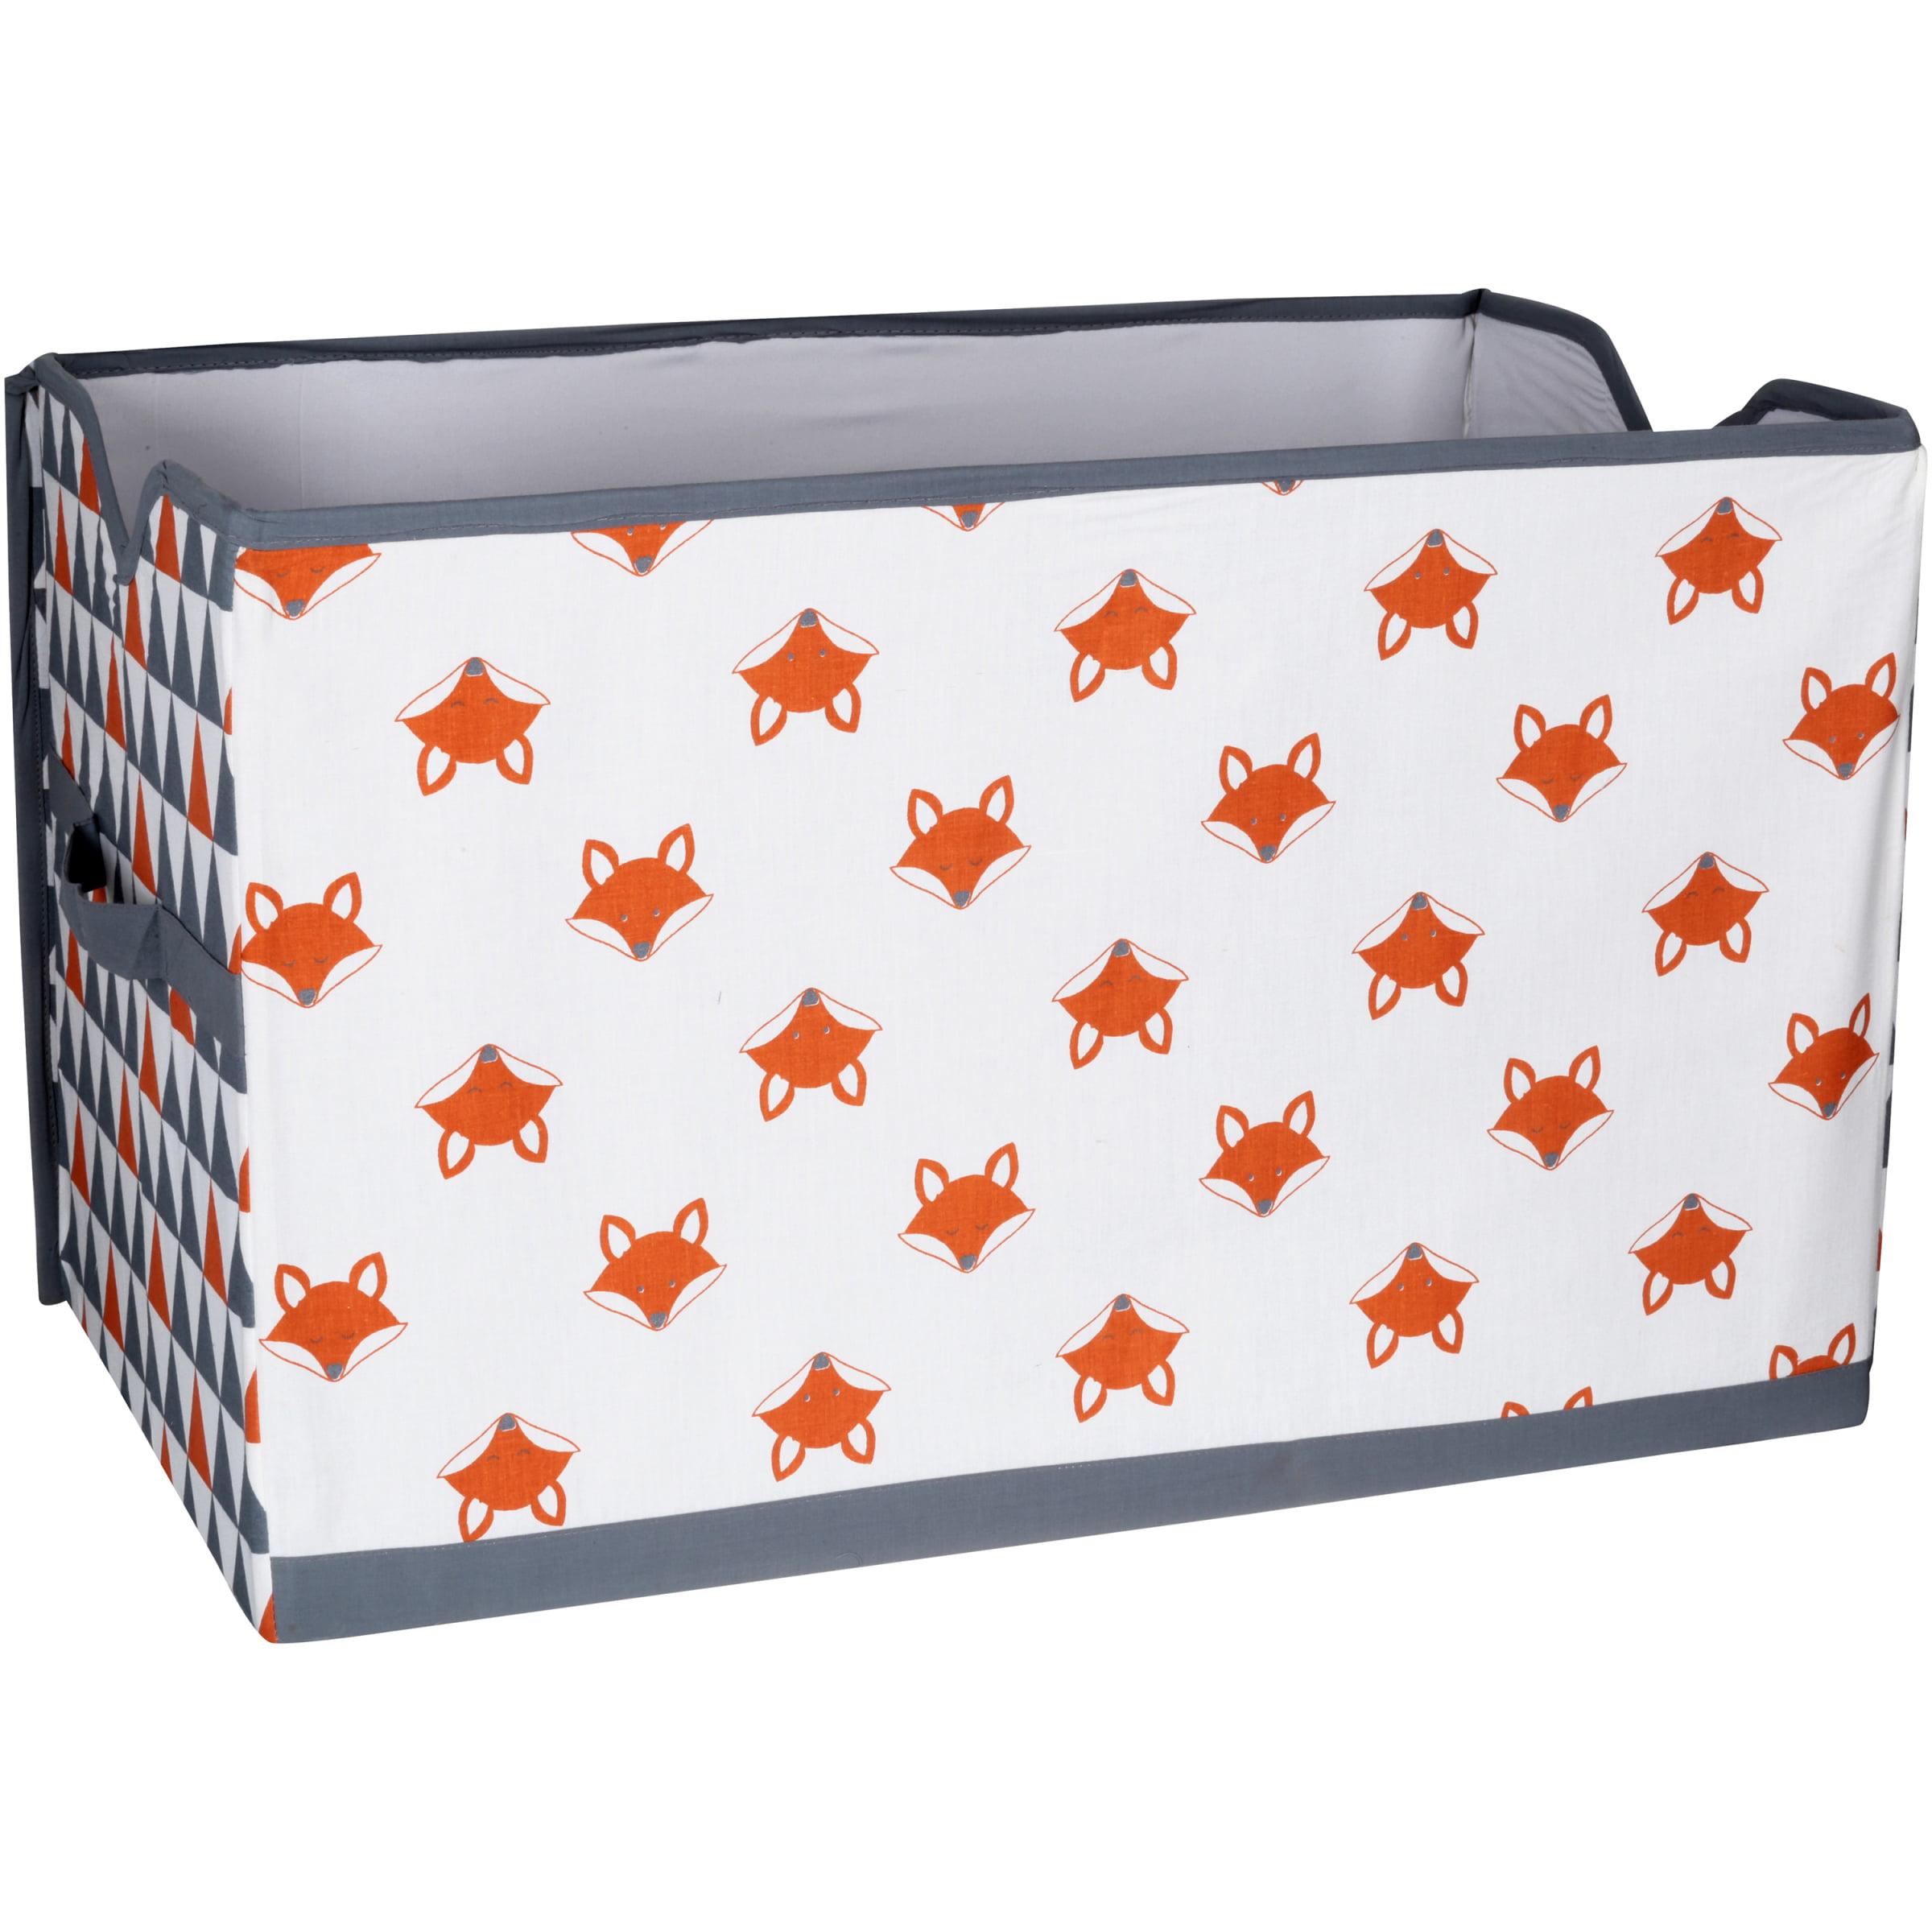 Bacati Playful Foxs Hamper Orange//Grey